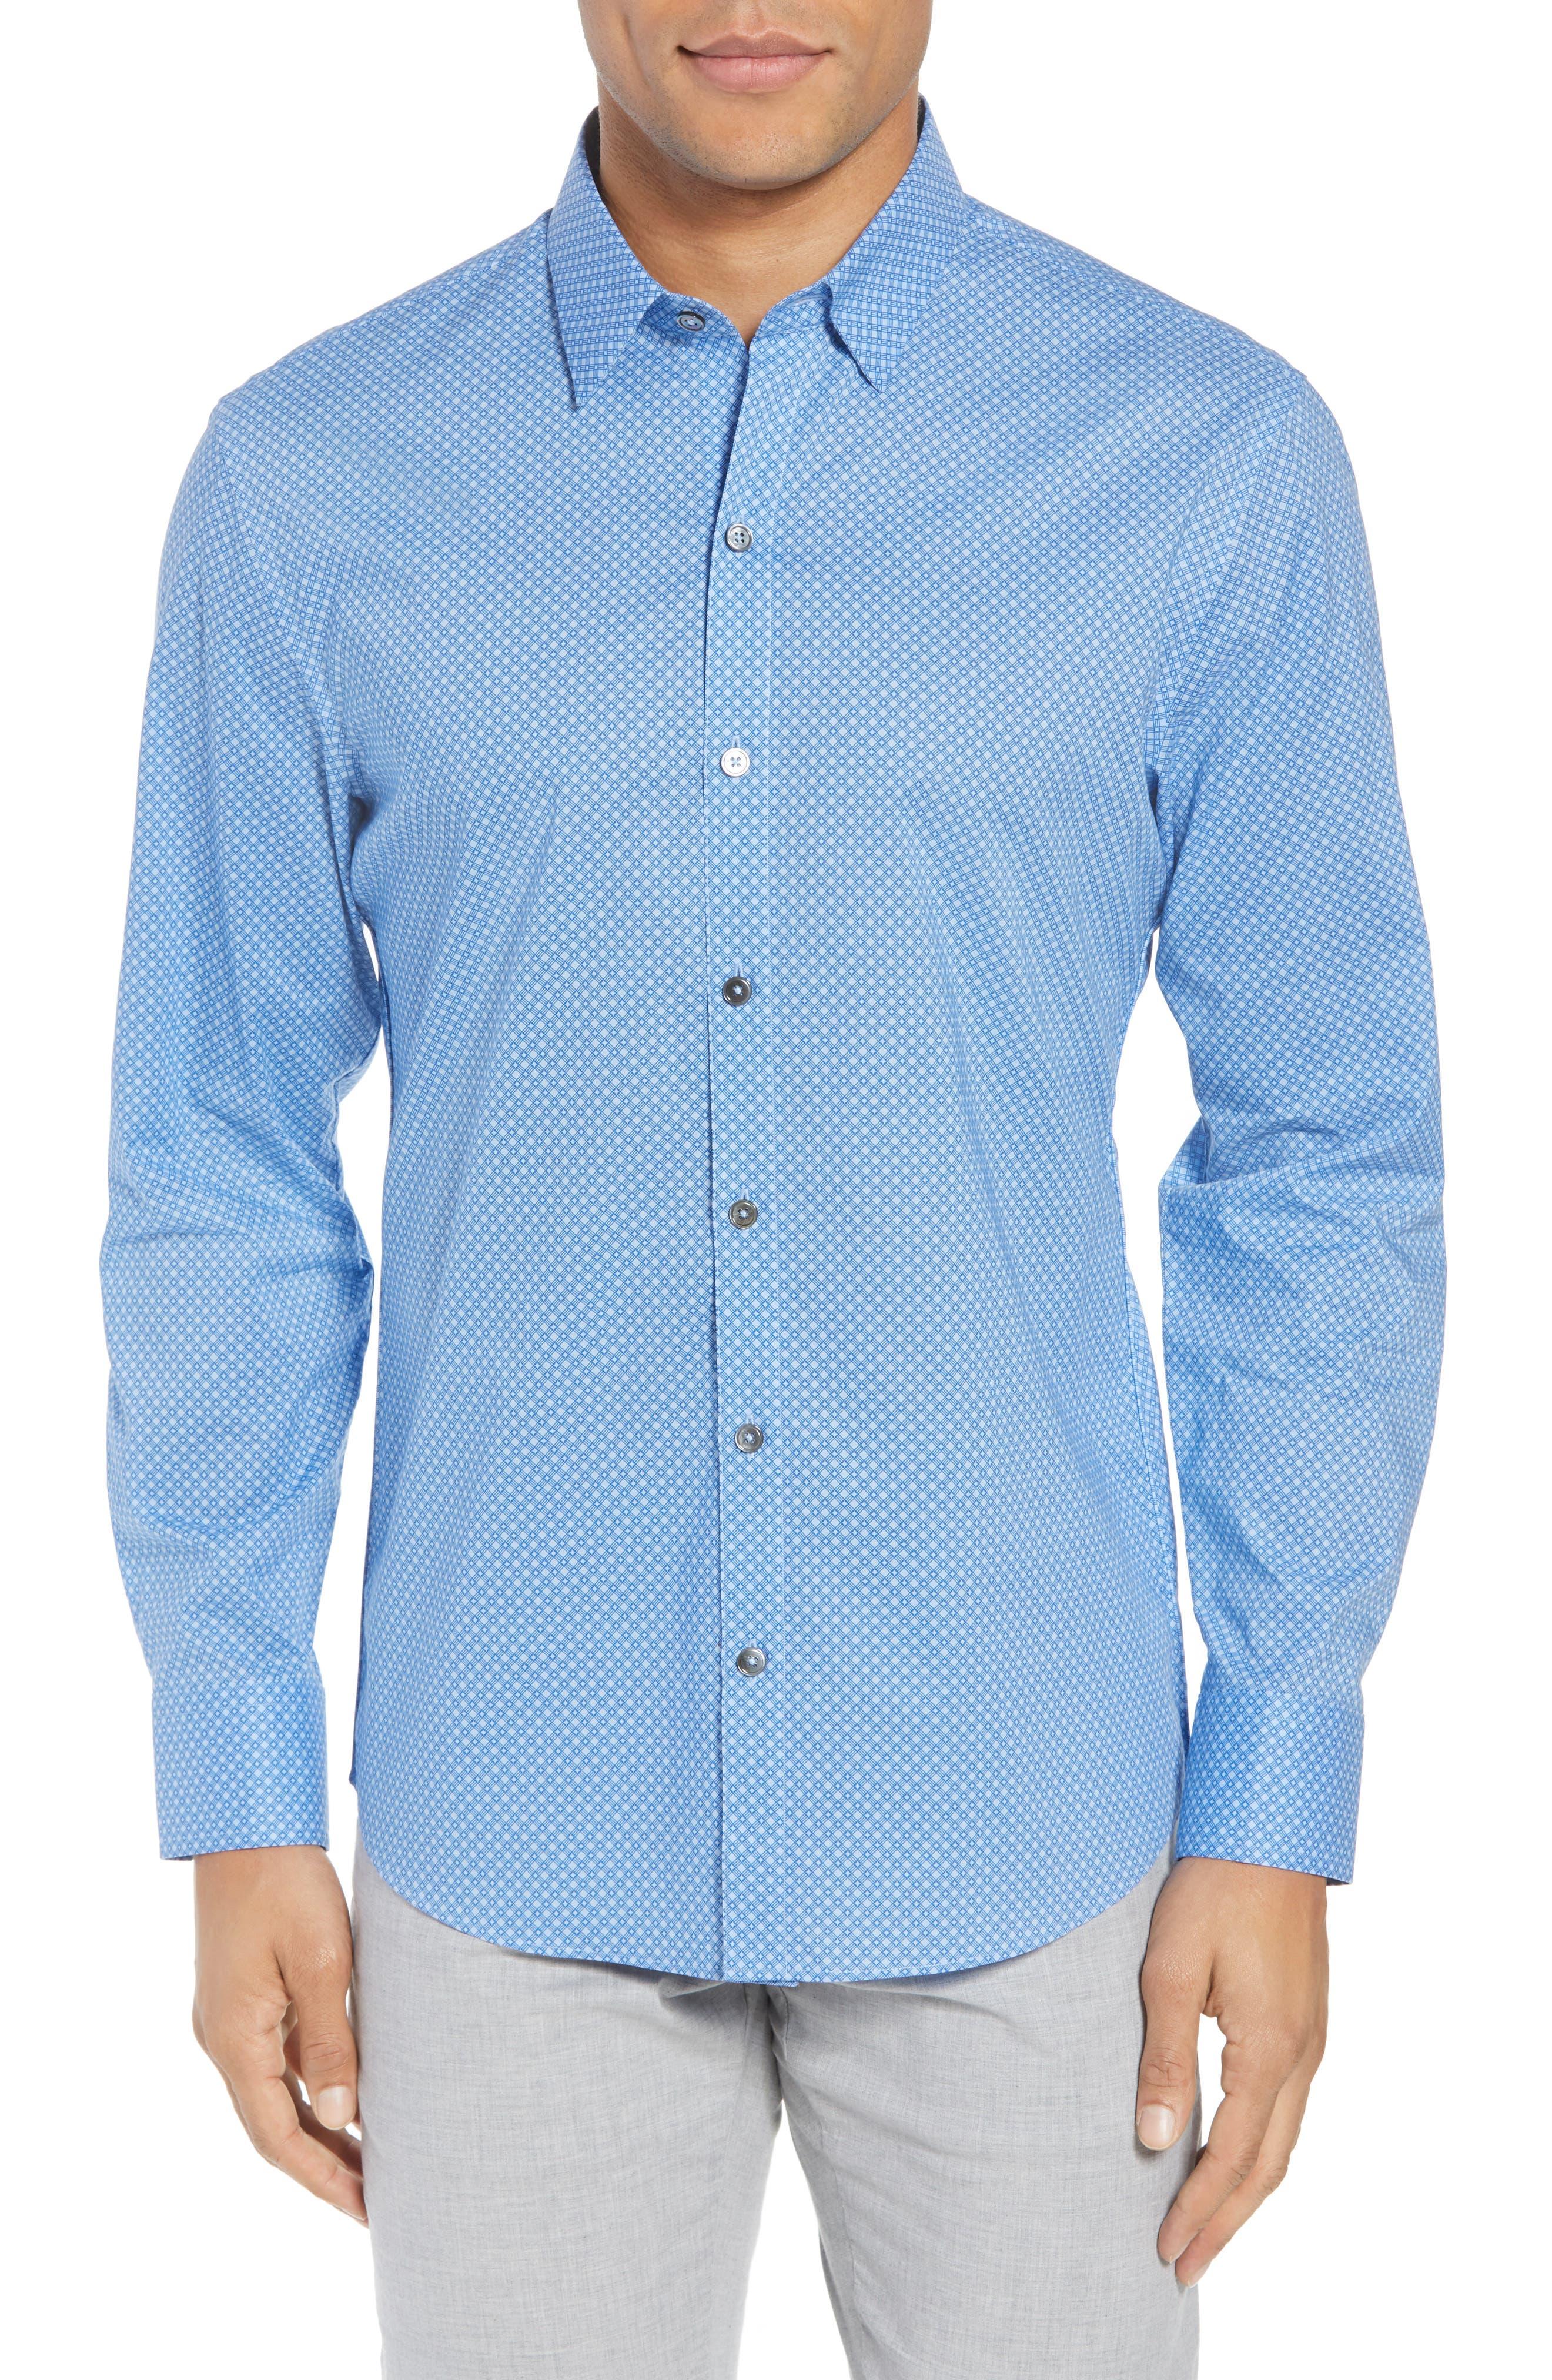 Ethan Slim Fit Sport Shirt,                             Main thumbnail 1, color,                             Blue